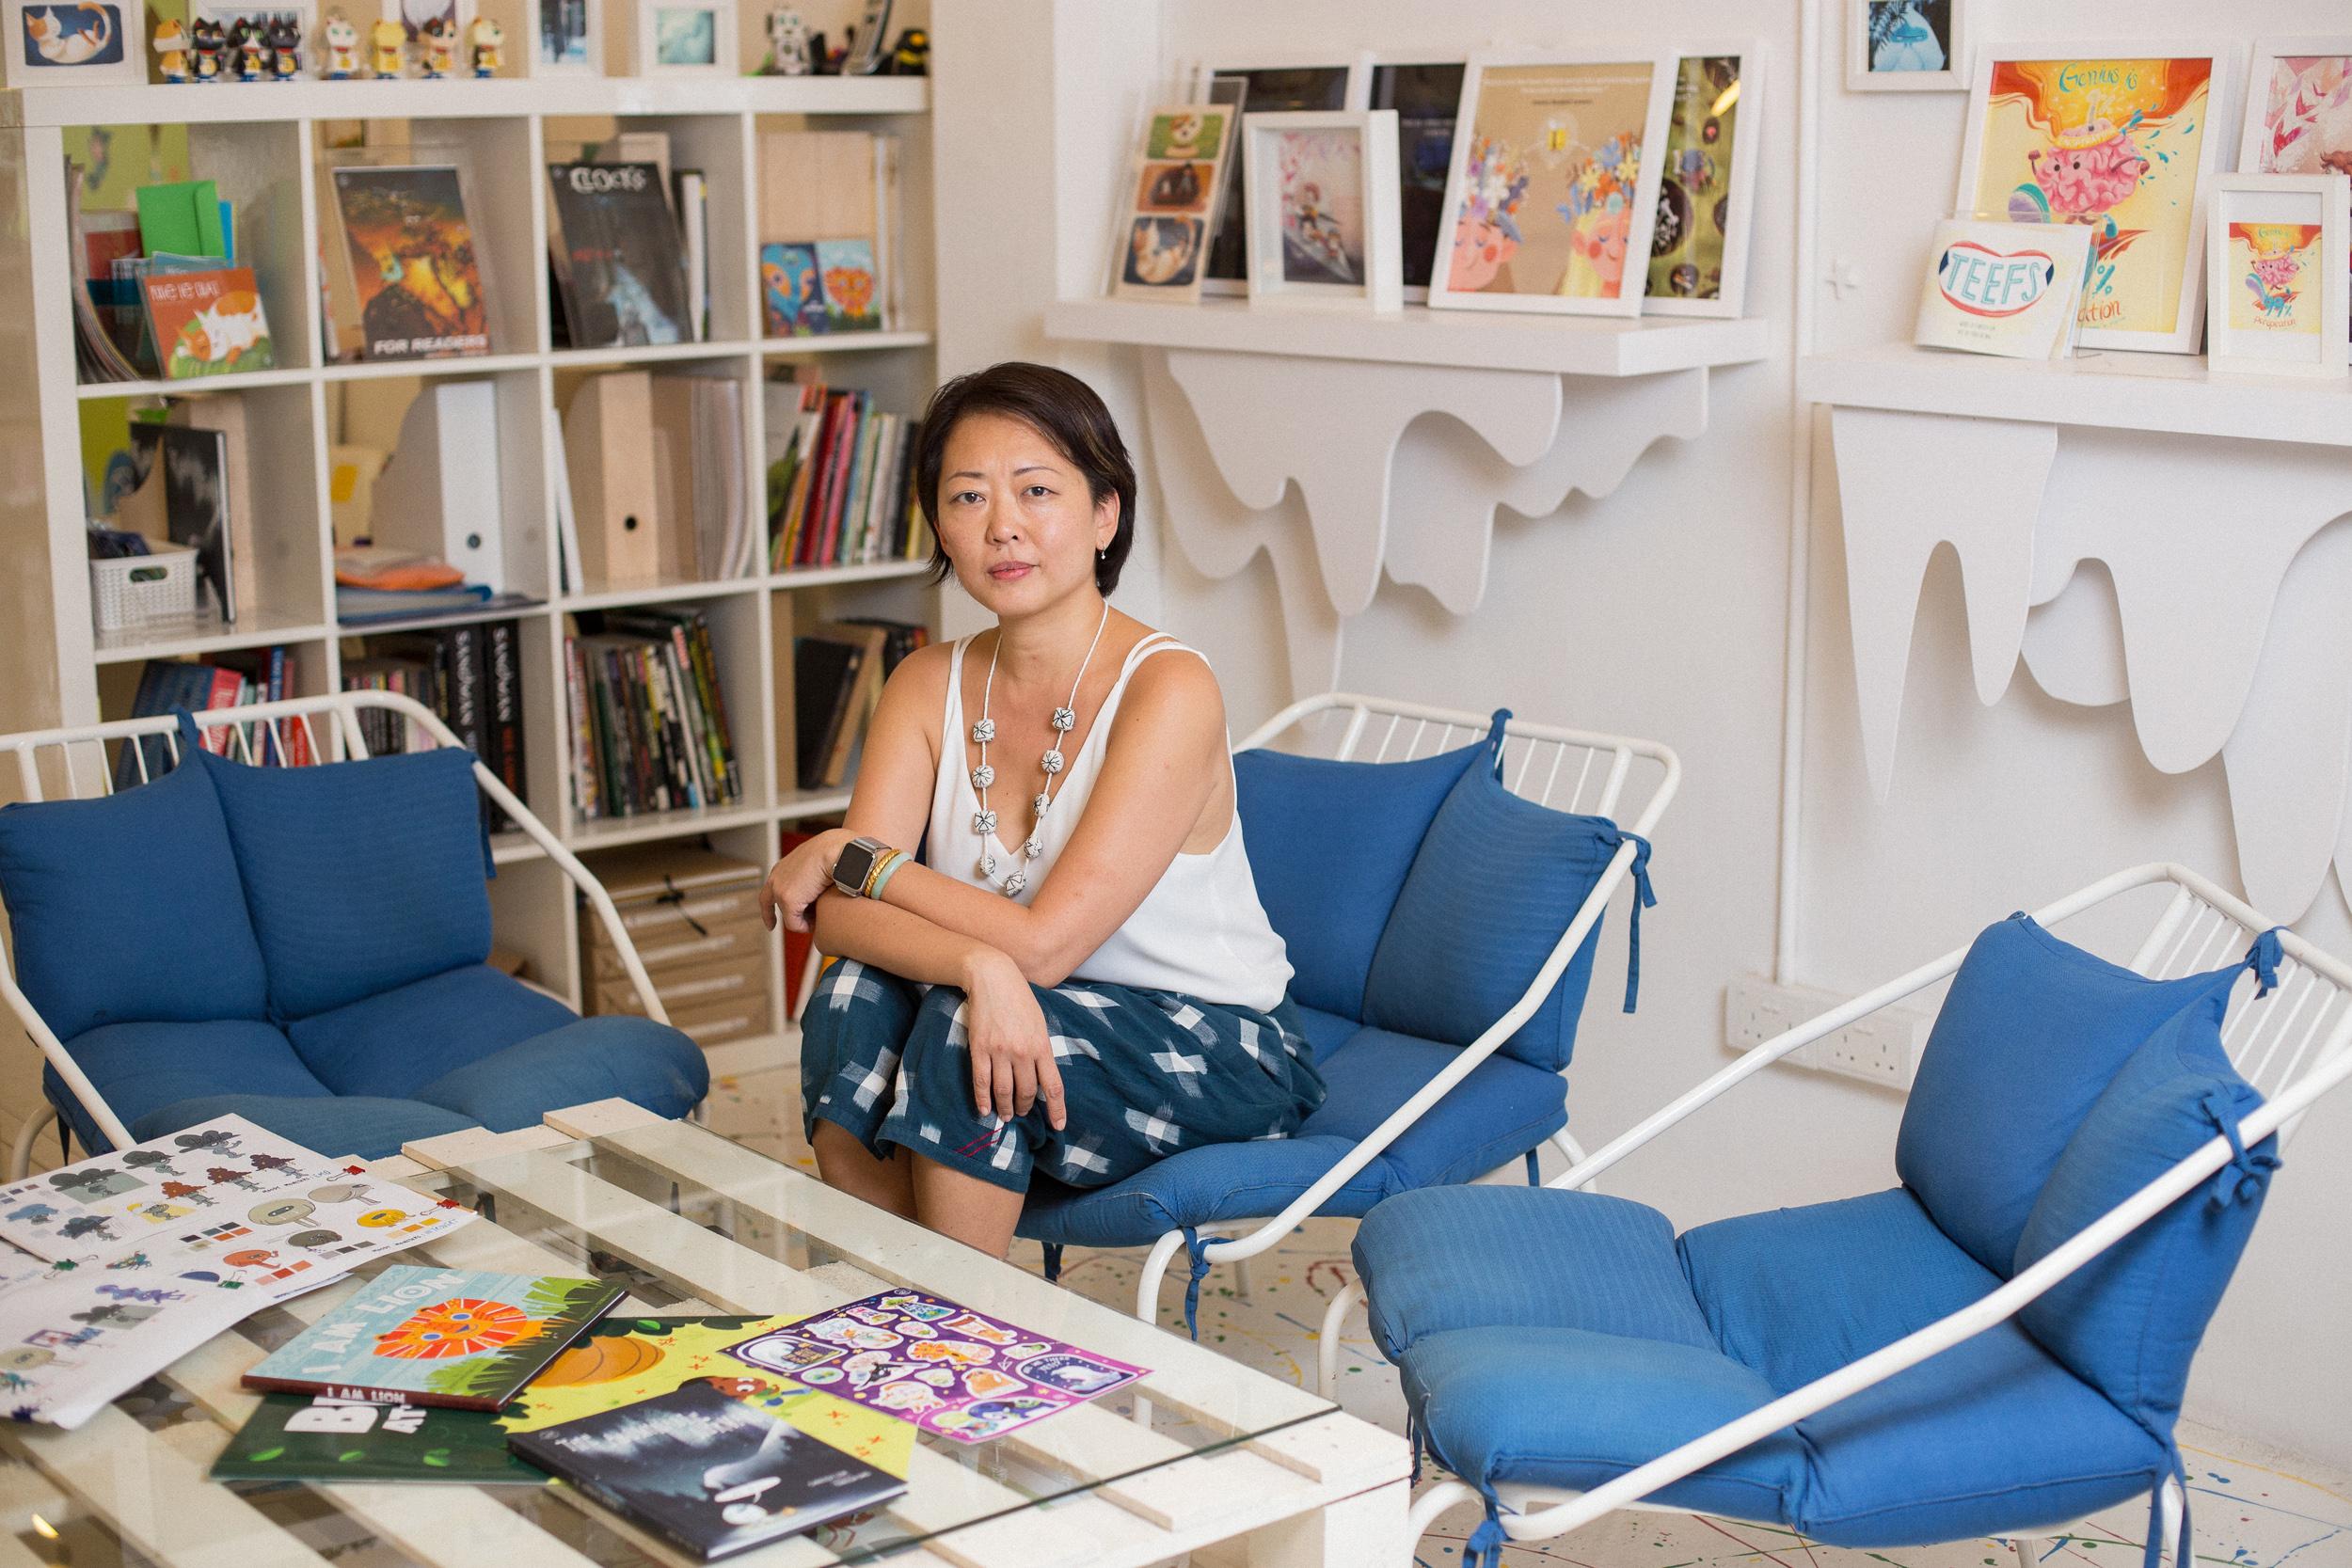 singapore-photographer-zainal-zainal-studio-mci-sme-towkay-27.jpg